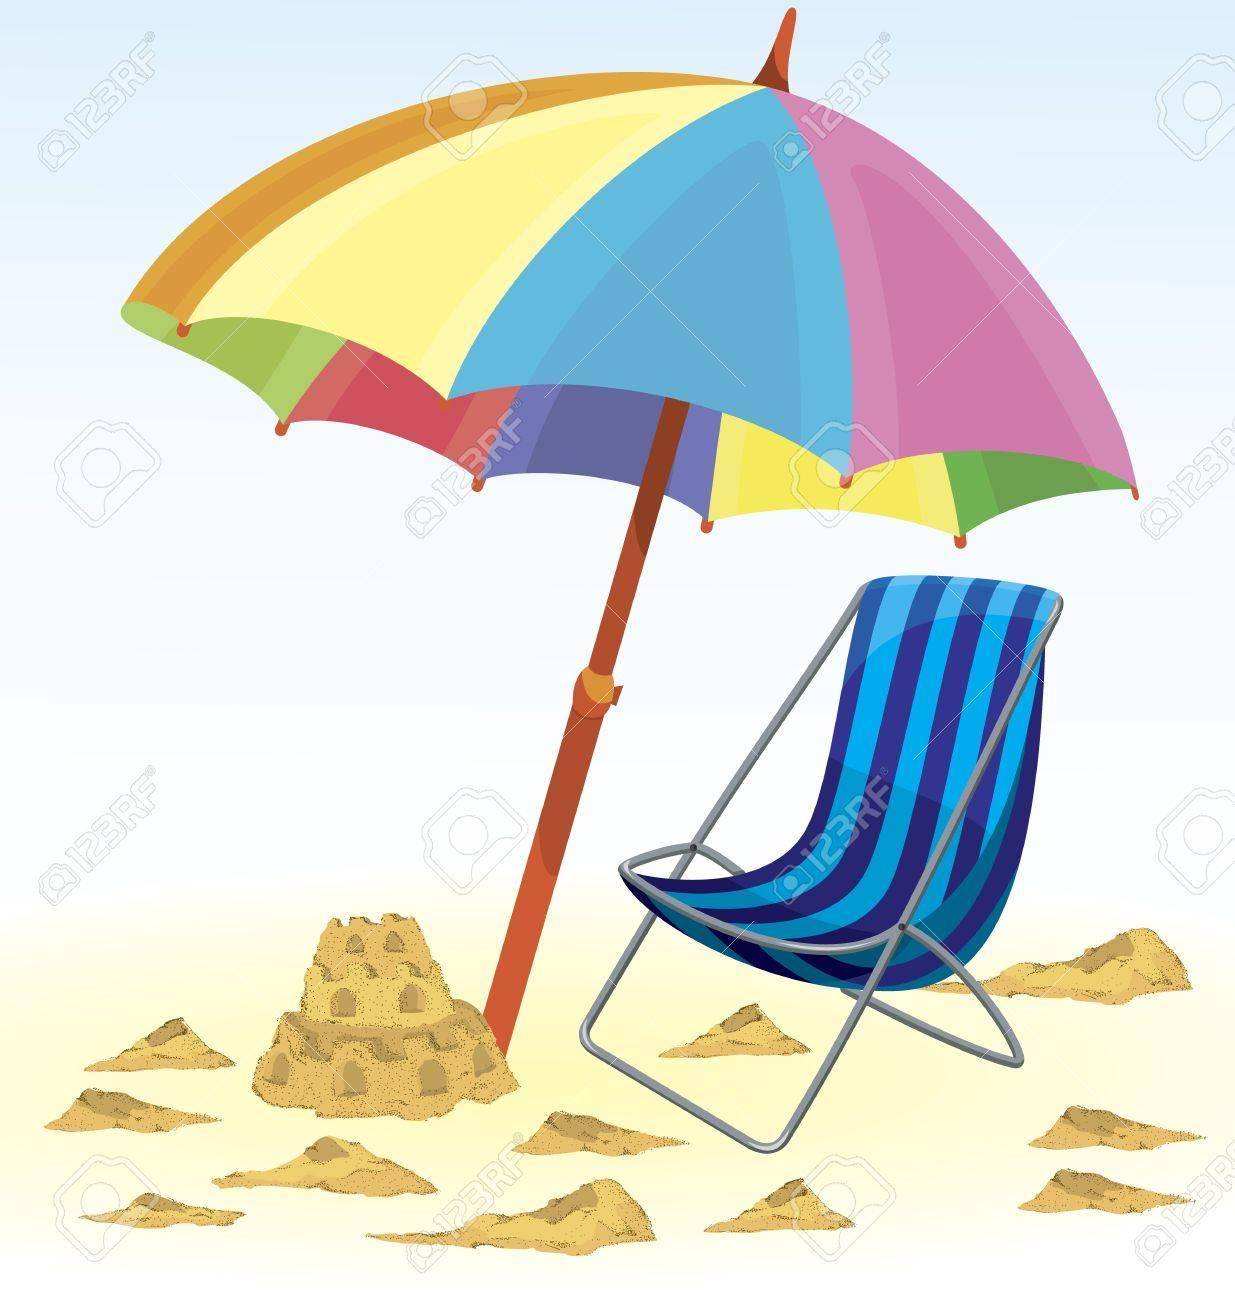 Sandburg clipart  Sommer Malvorlage | ambiznes.com